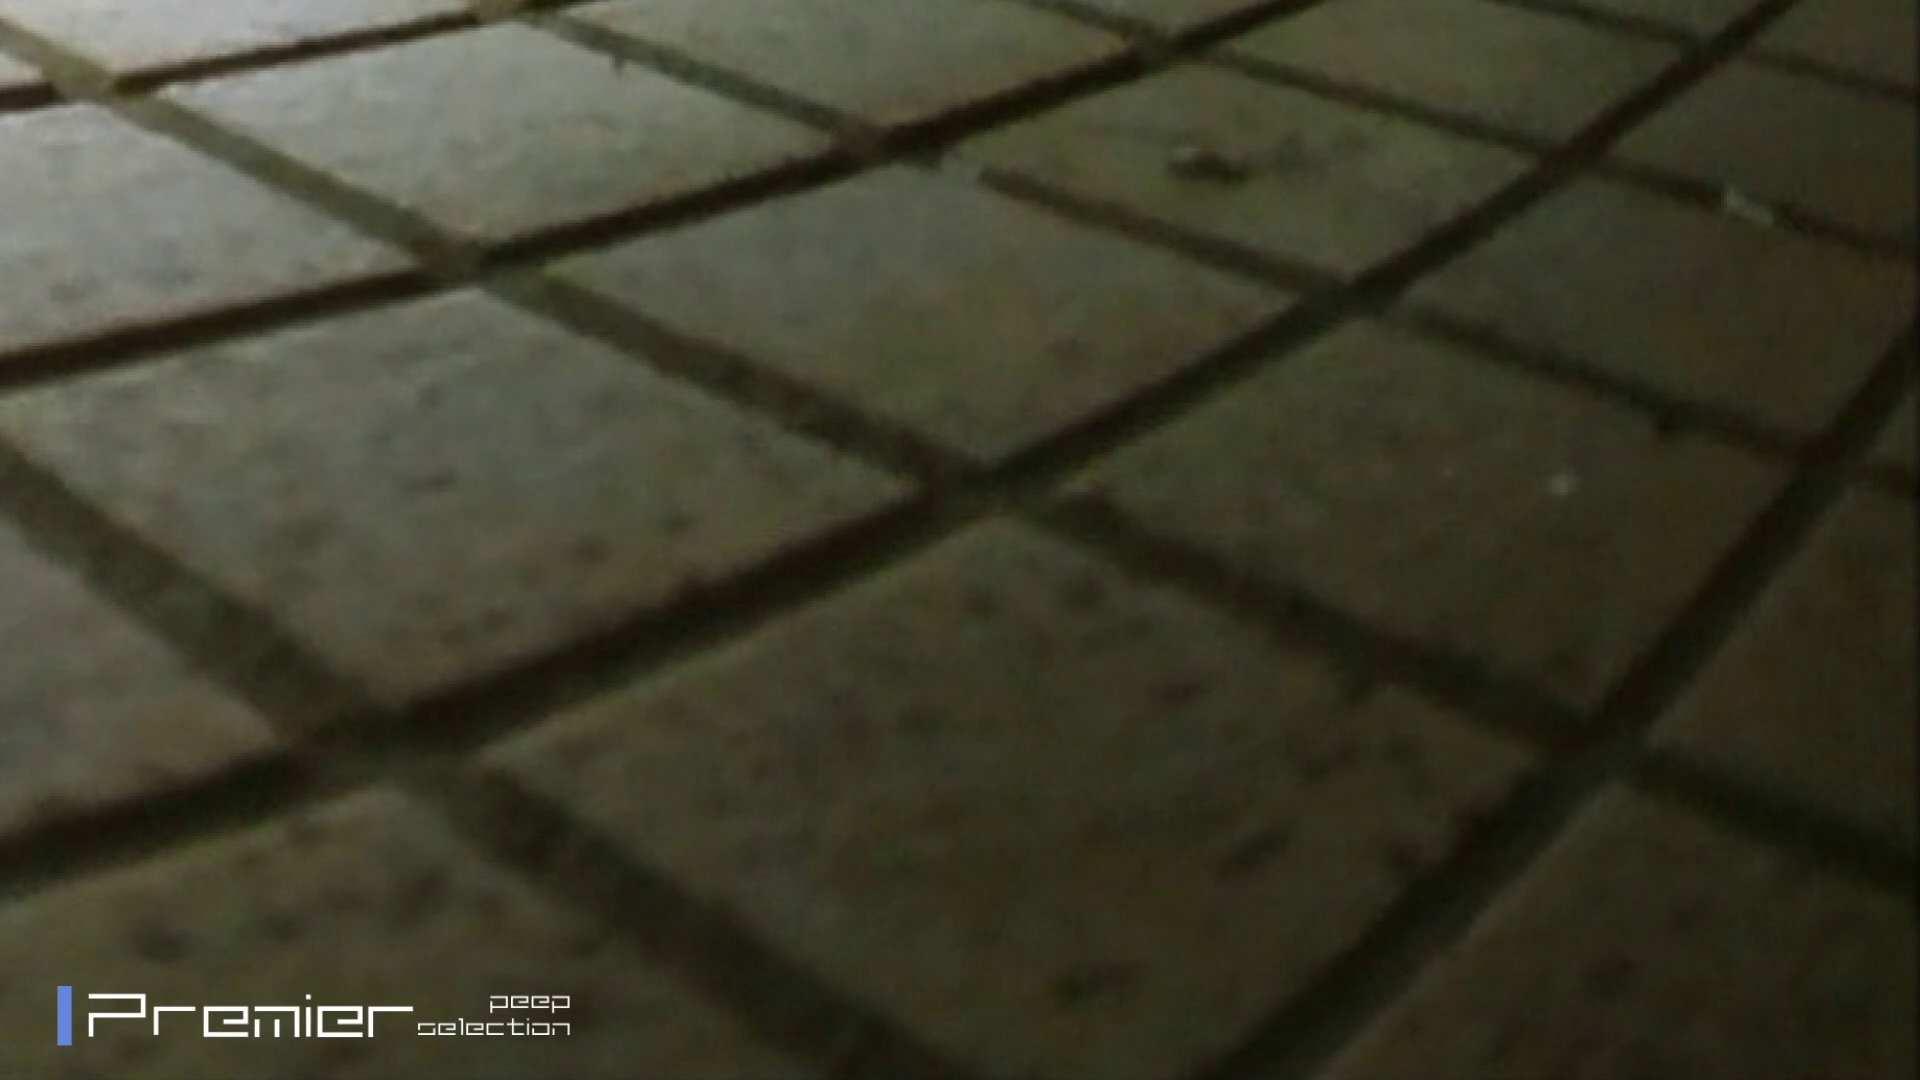 FHD激カワ!激やば! 復讐のトイレ盗撮 Vol.03 名作殿堂  78PIX 16